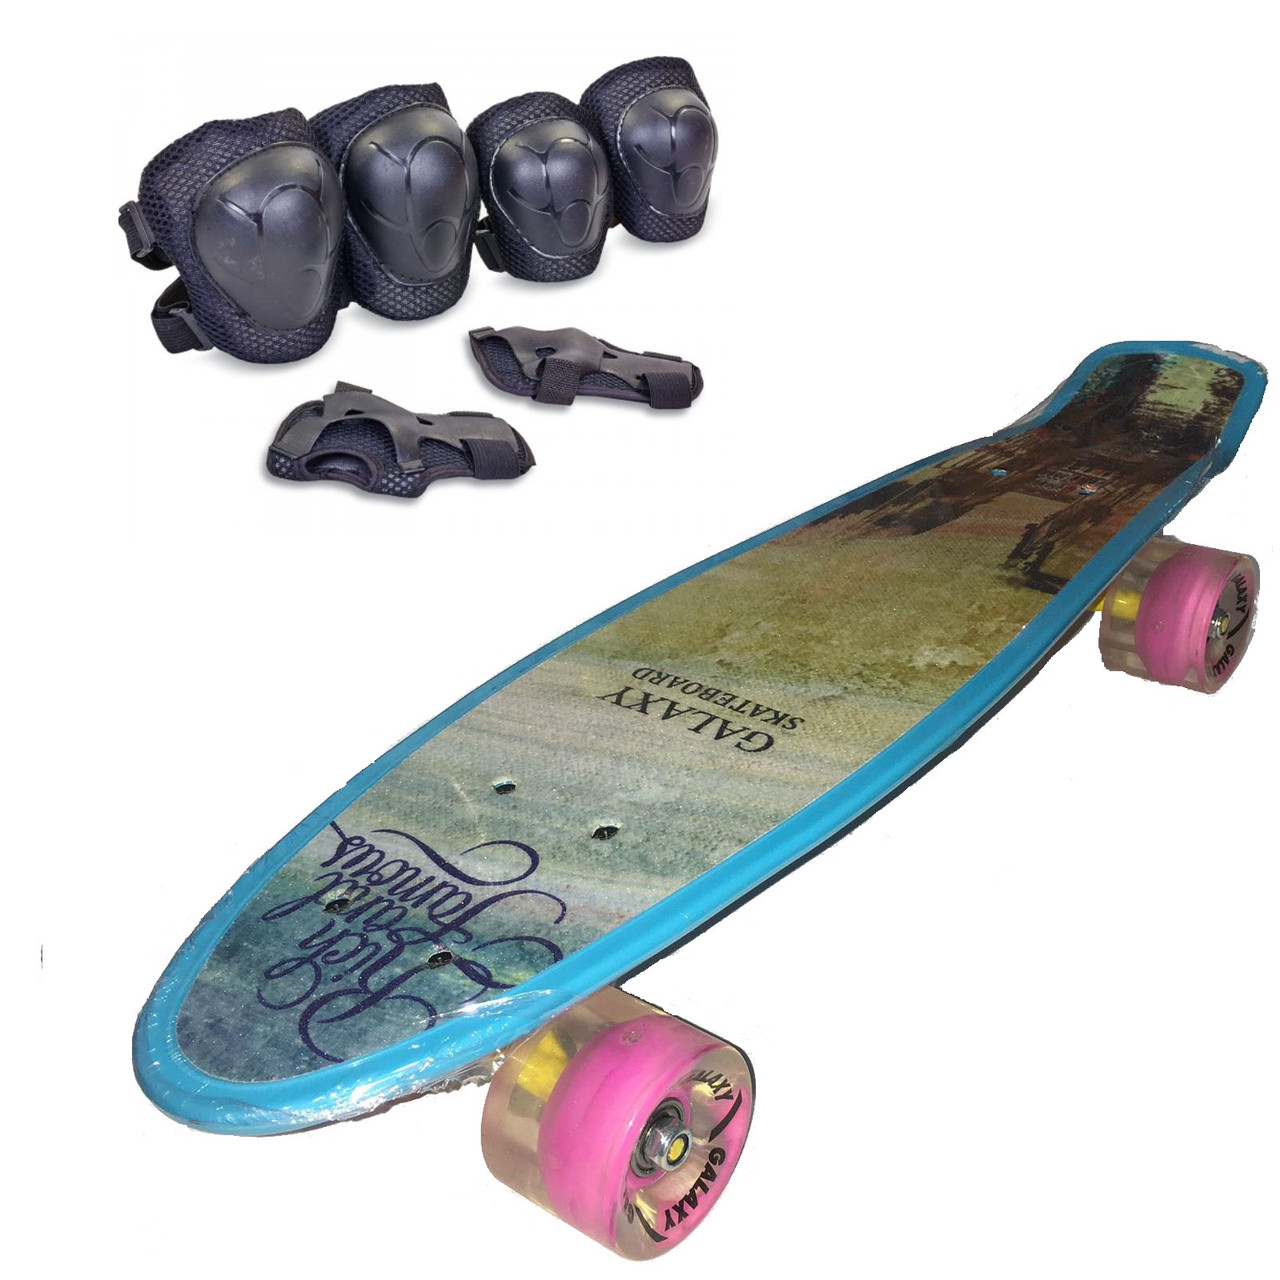 Пени Борд с светящимися колесами. Скейт голубой Penny Board + Подарок